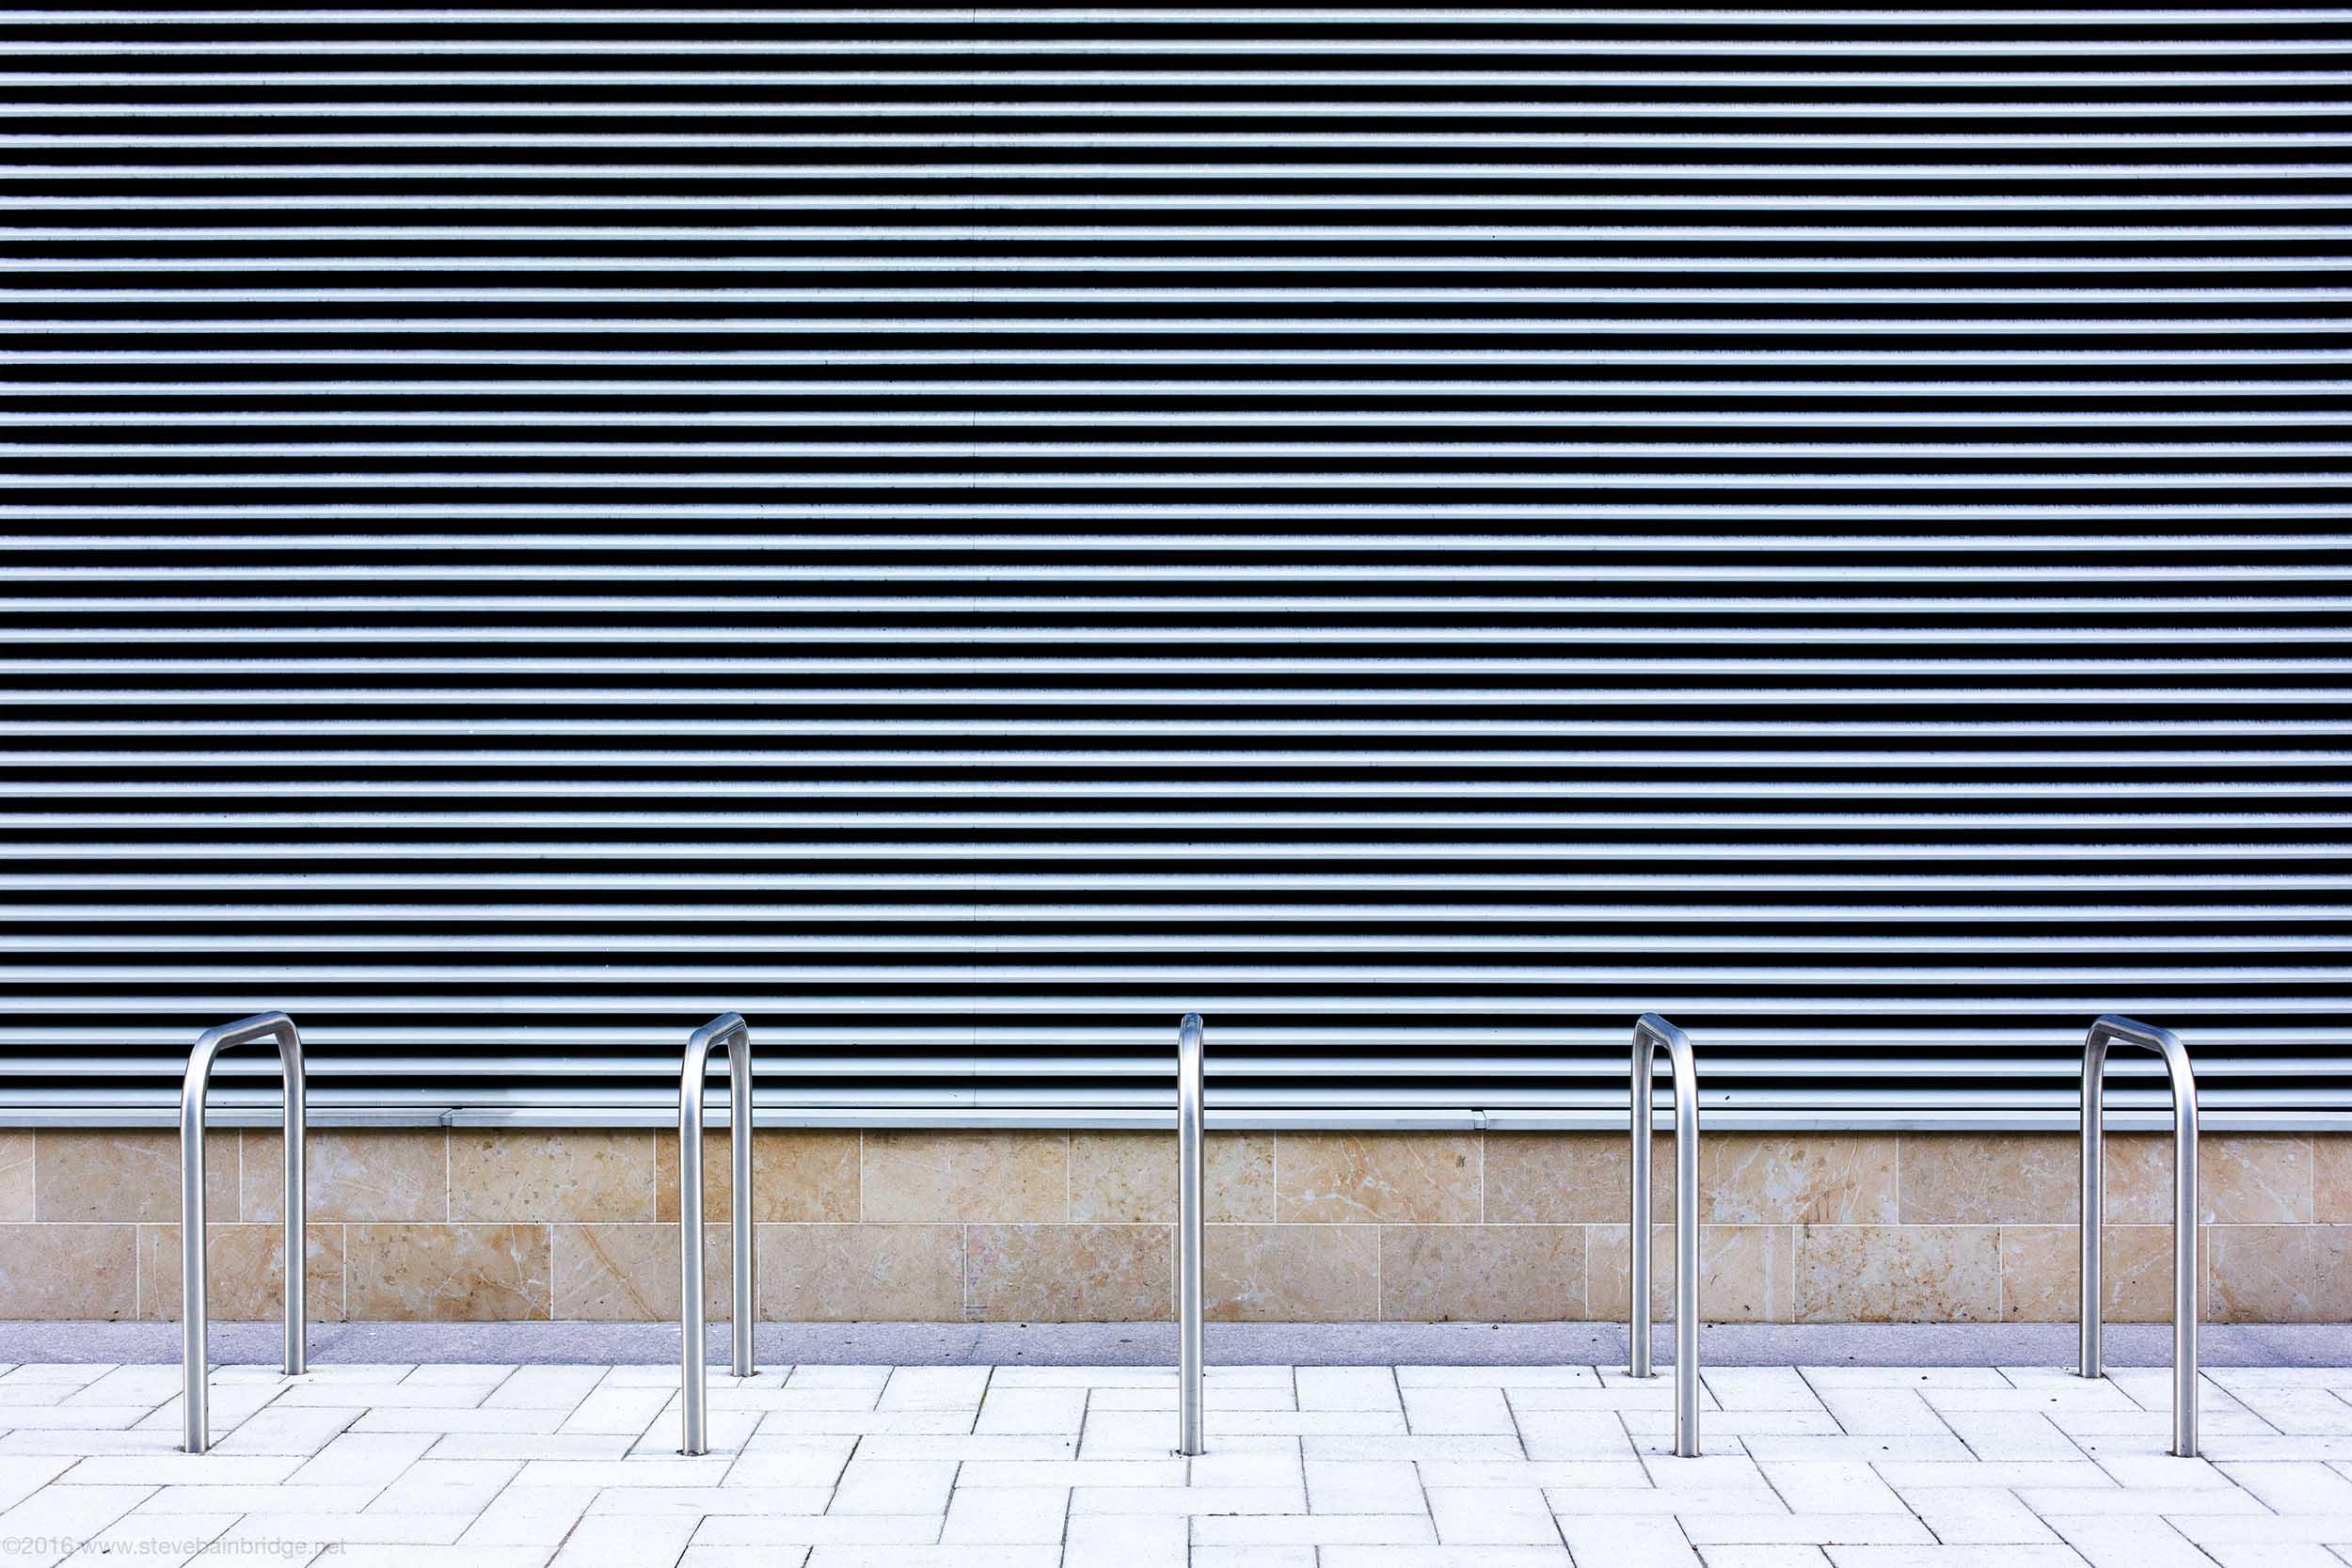 Canary Wharf-bike racks.jpg